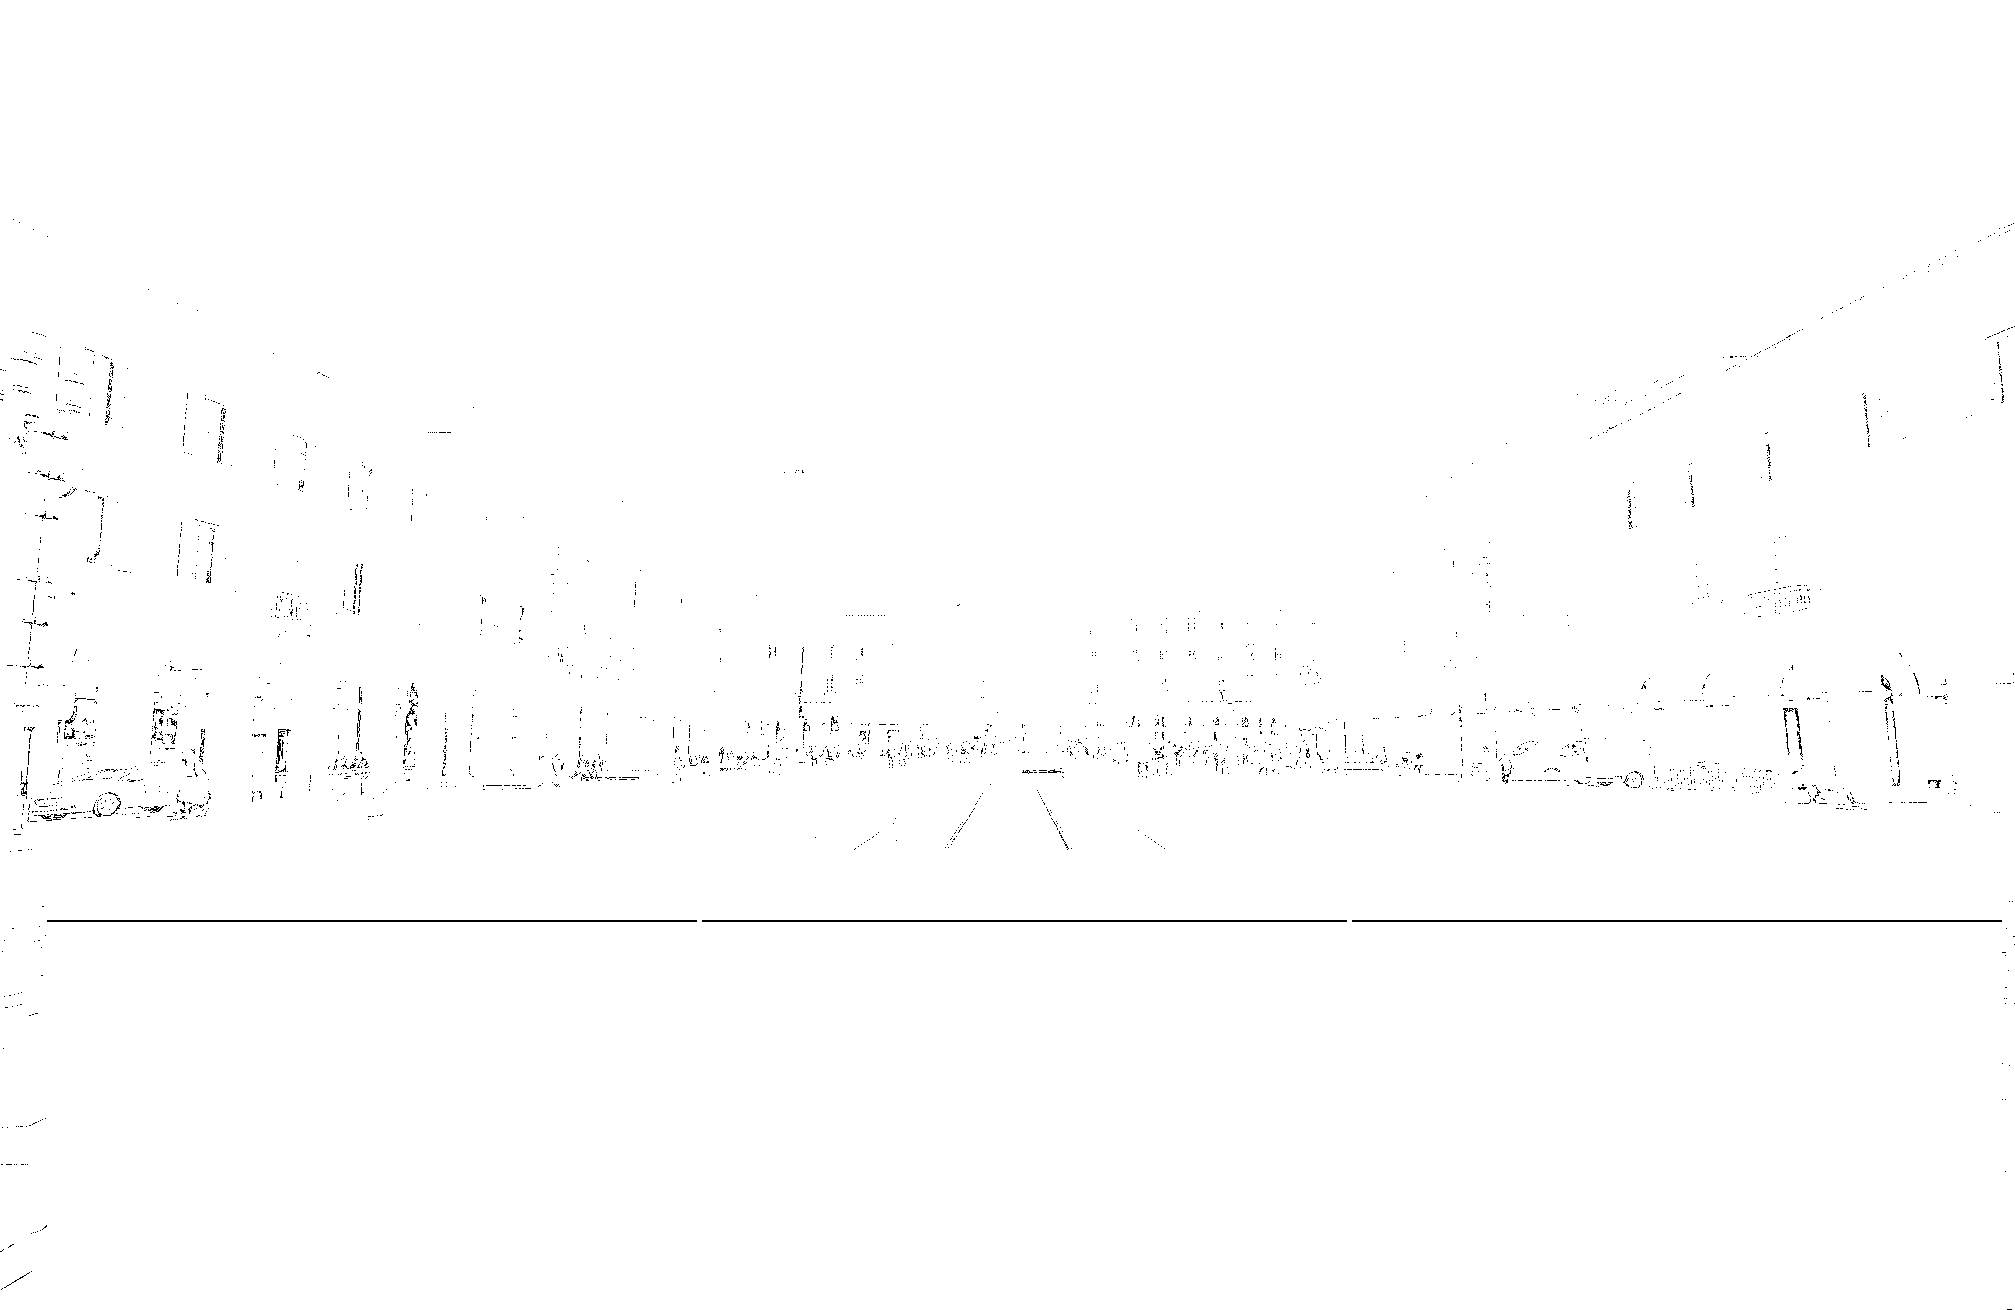 Météo Nice: Prévisions du mardi 13 avril 2021